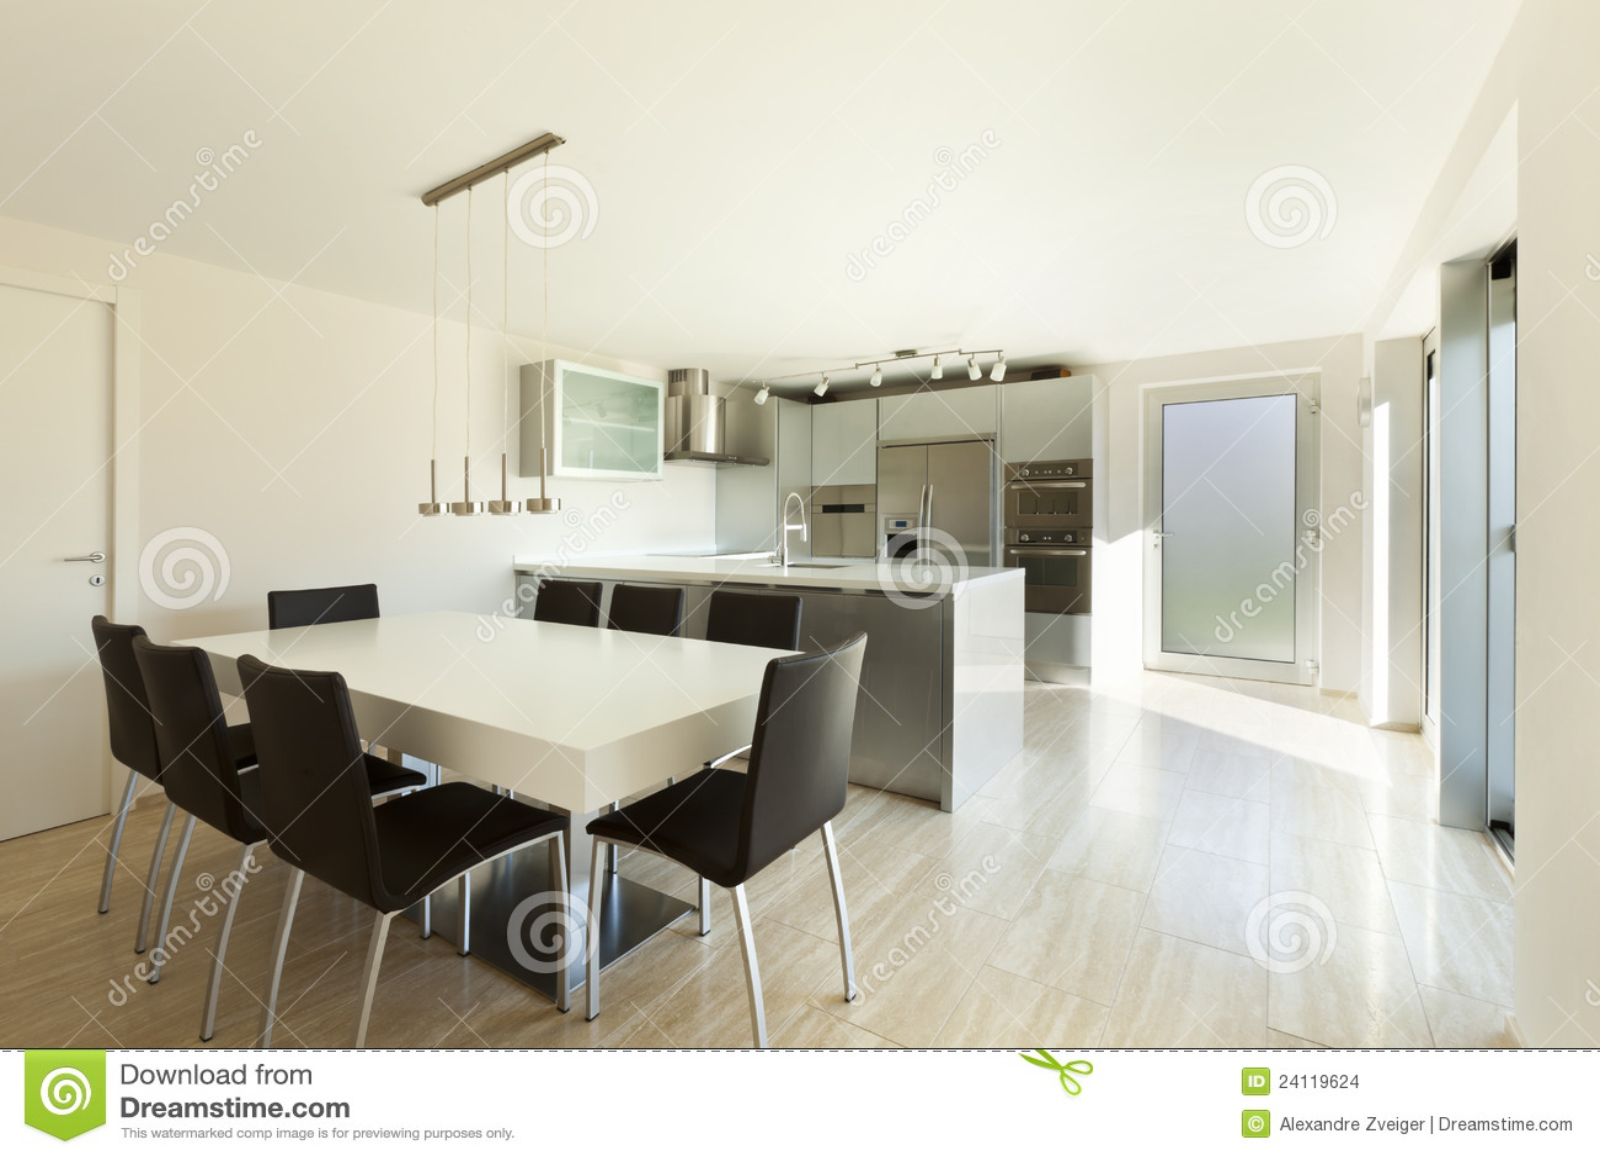 Casa moderna hermosa interior imagenes de archivo for Interior de casas modernas